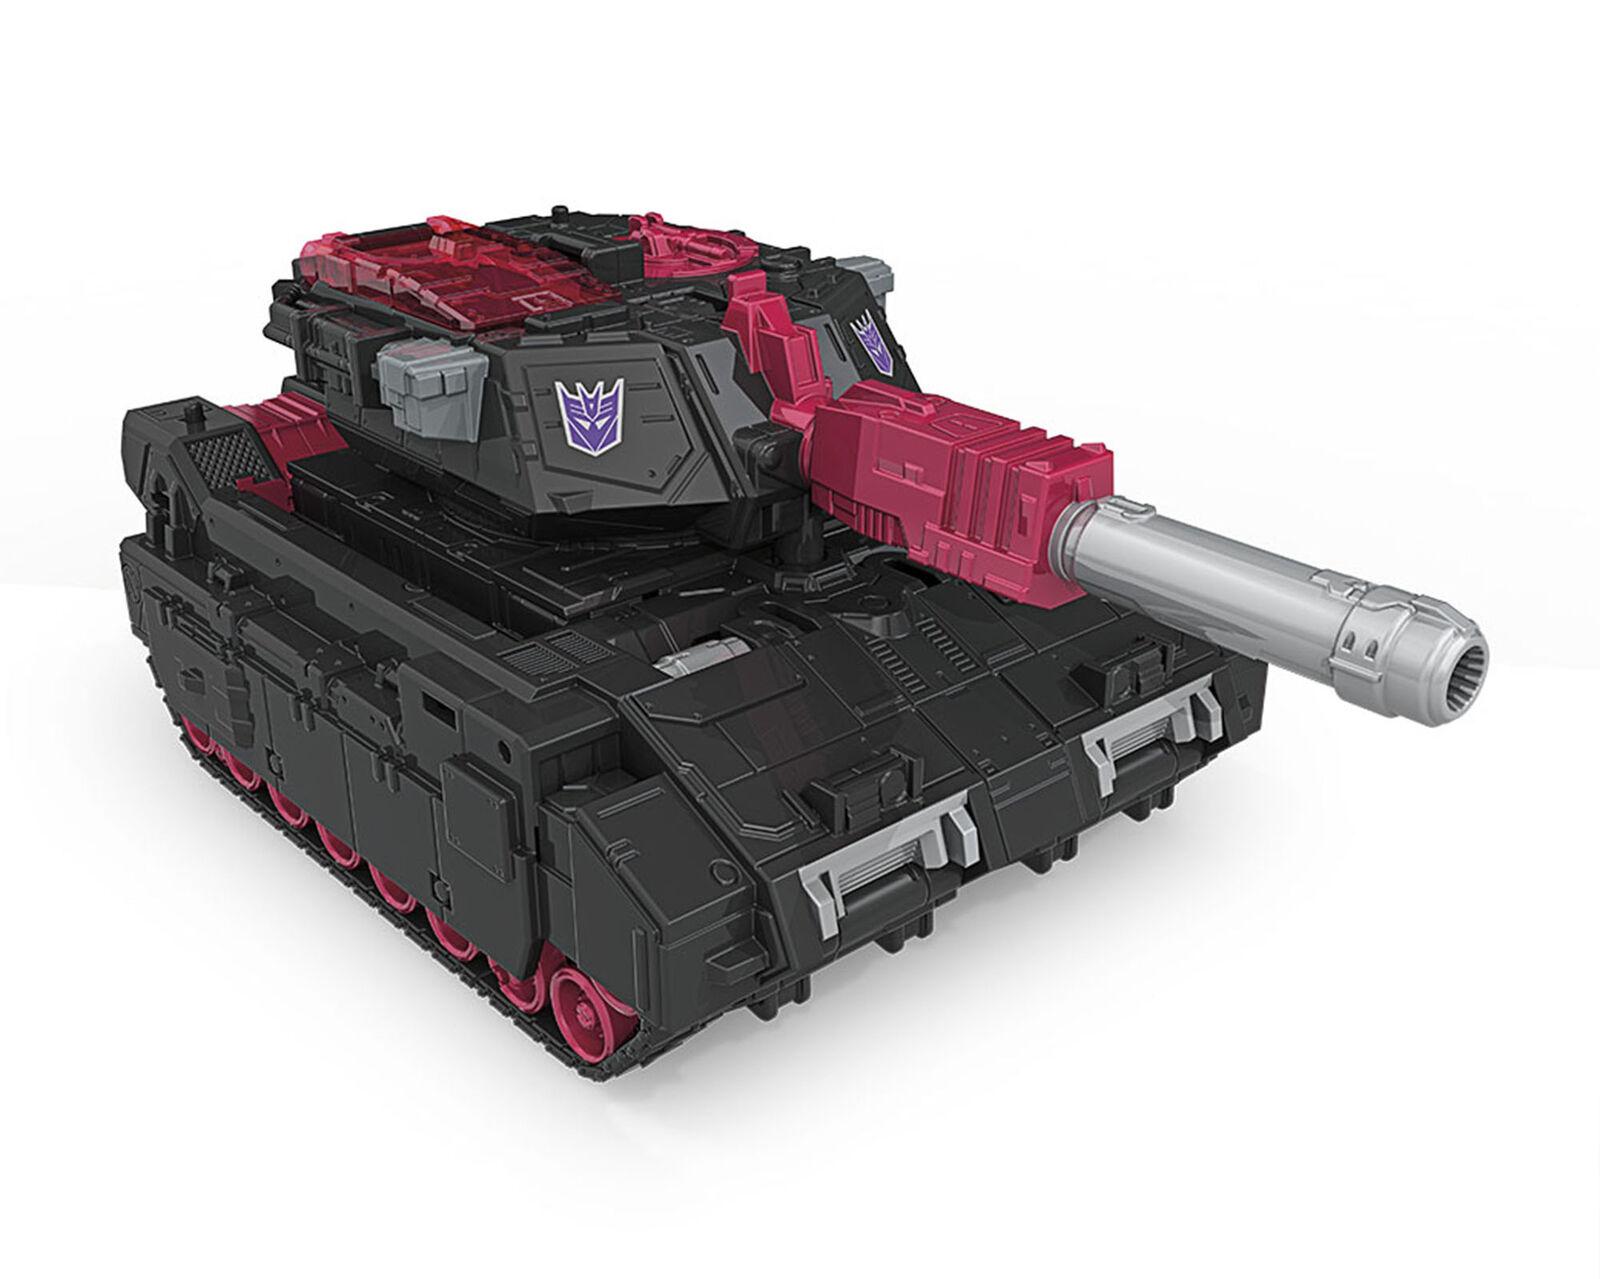 Transformers Titans Return Class L SKY SHADOW Robot Action Figure Kinder Toy